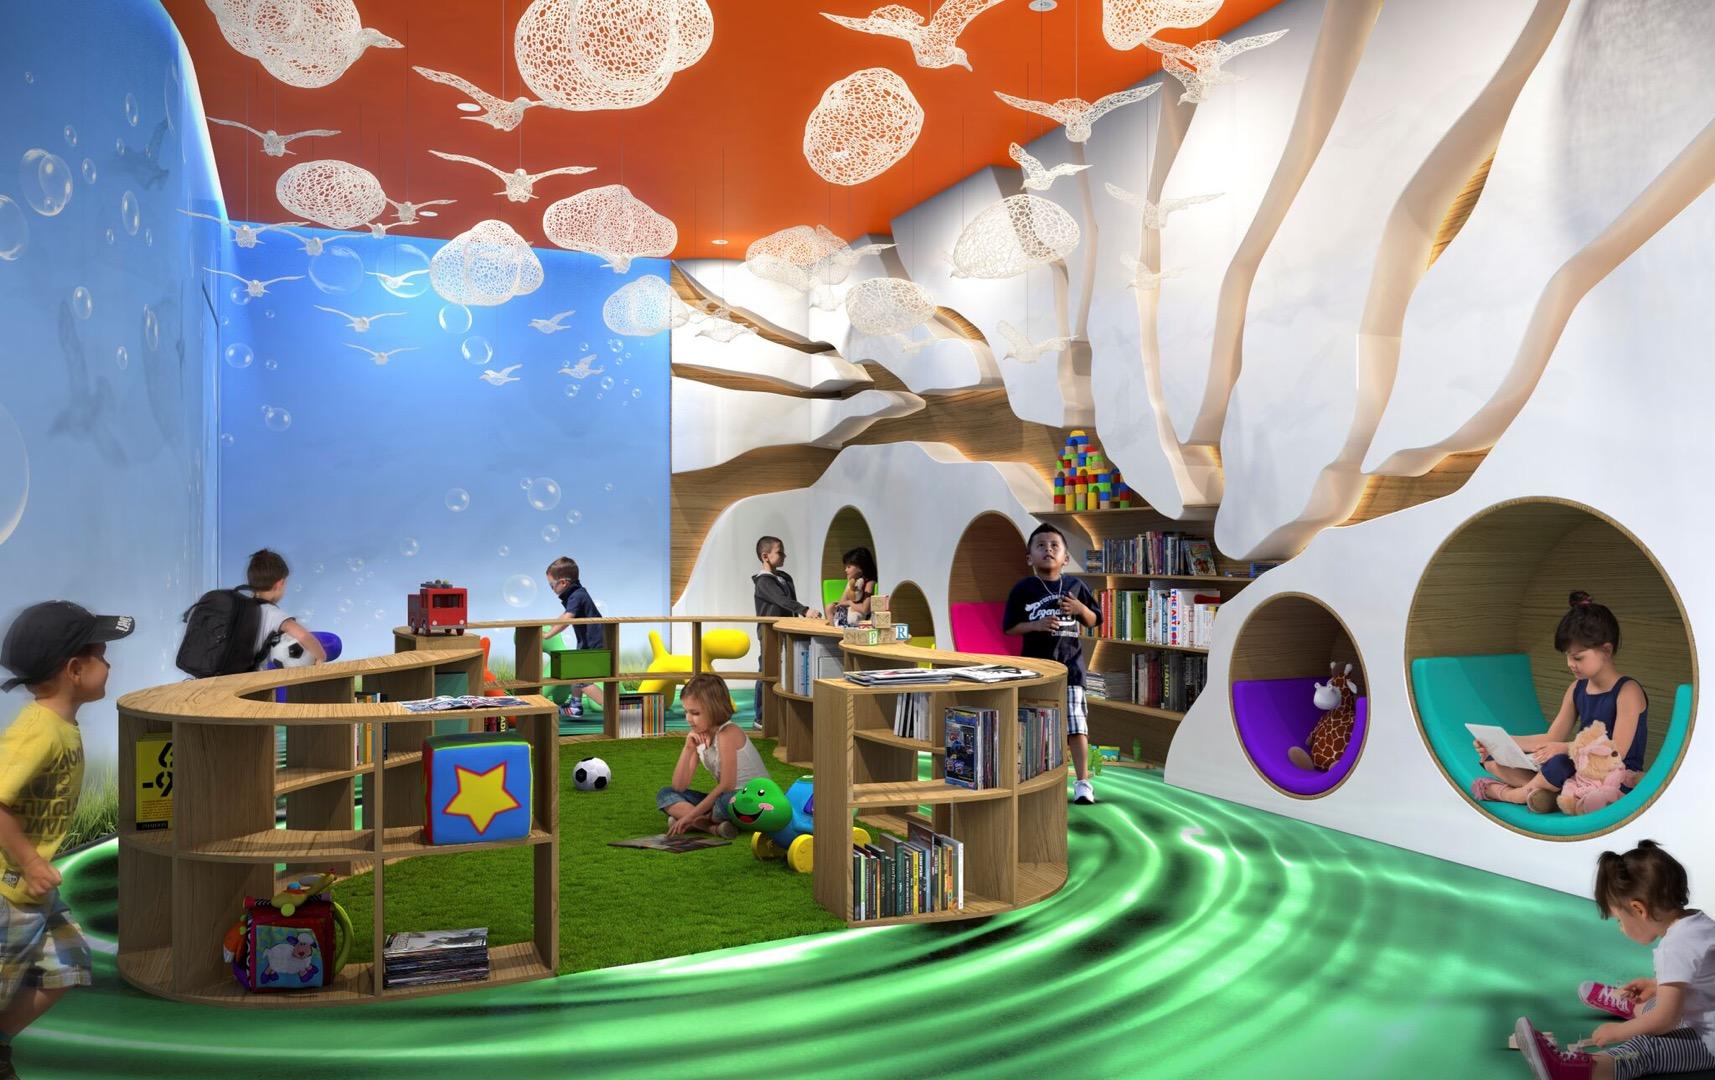 Children's play area image